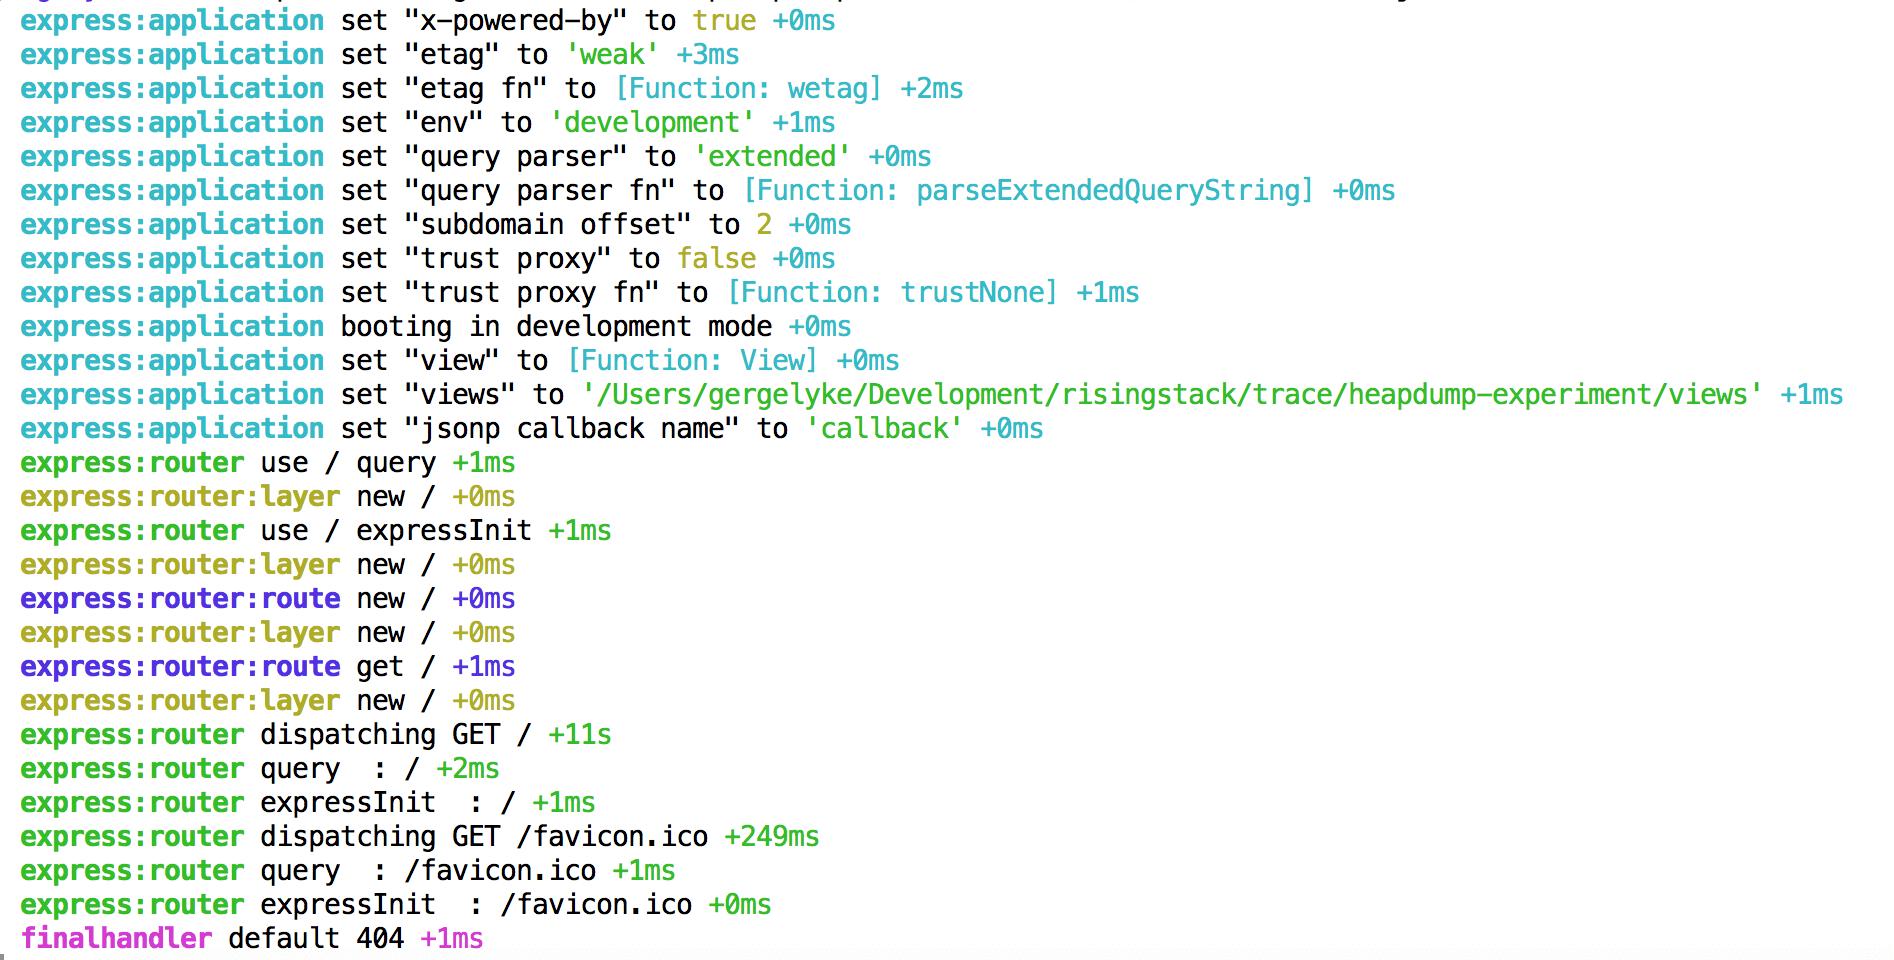 Node.js logging express output